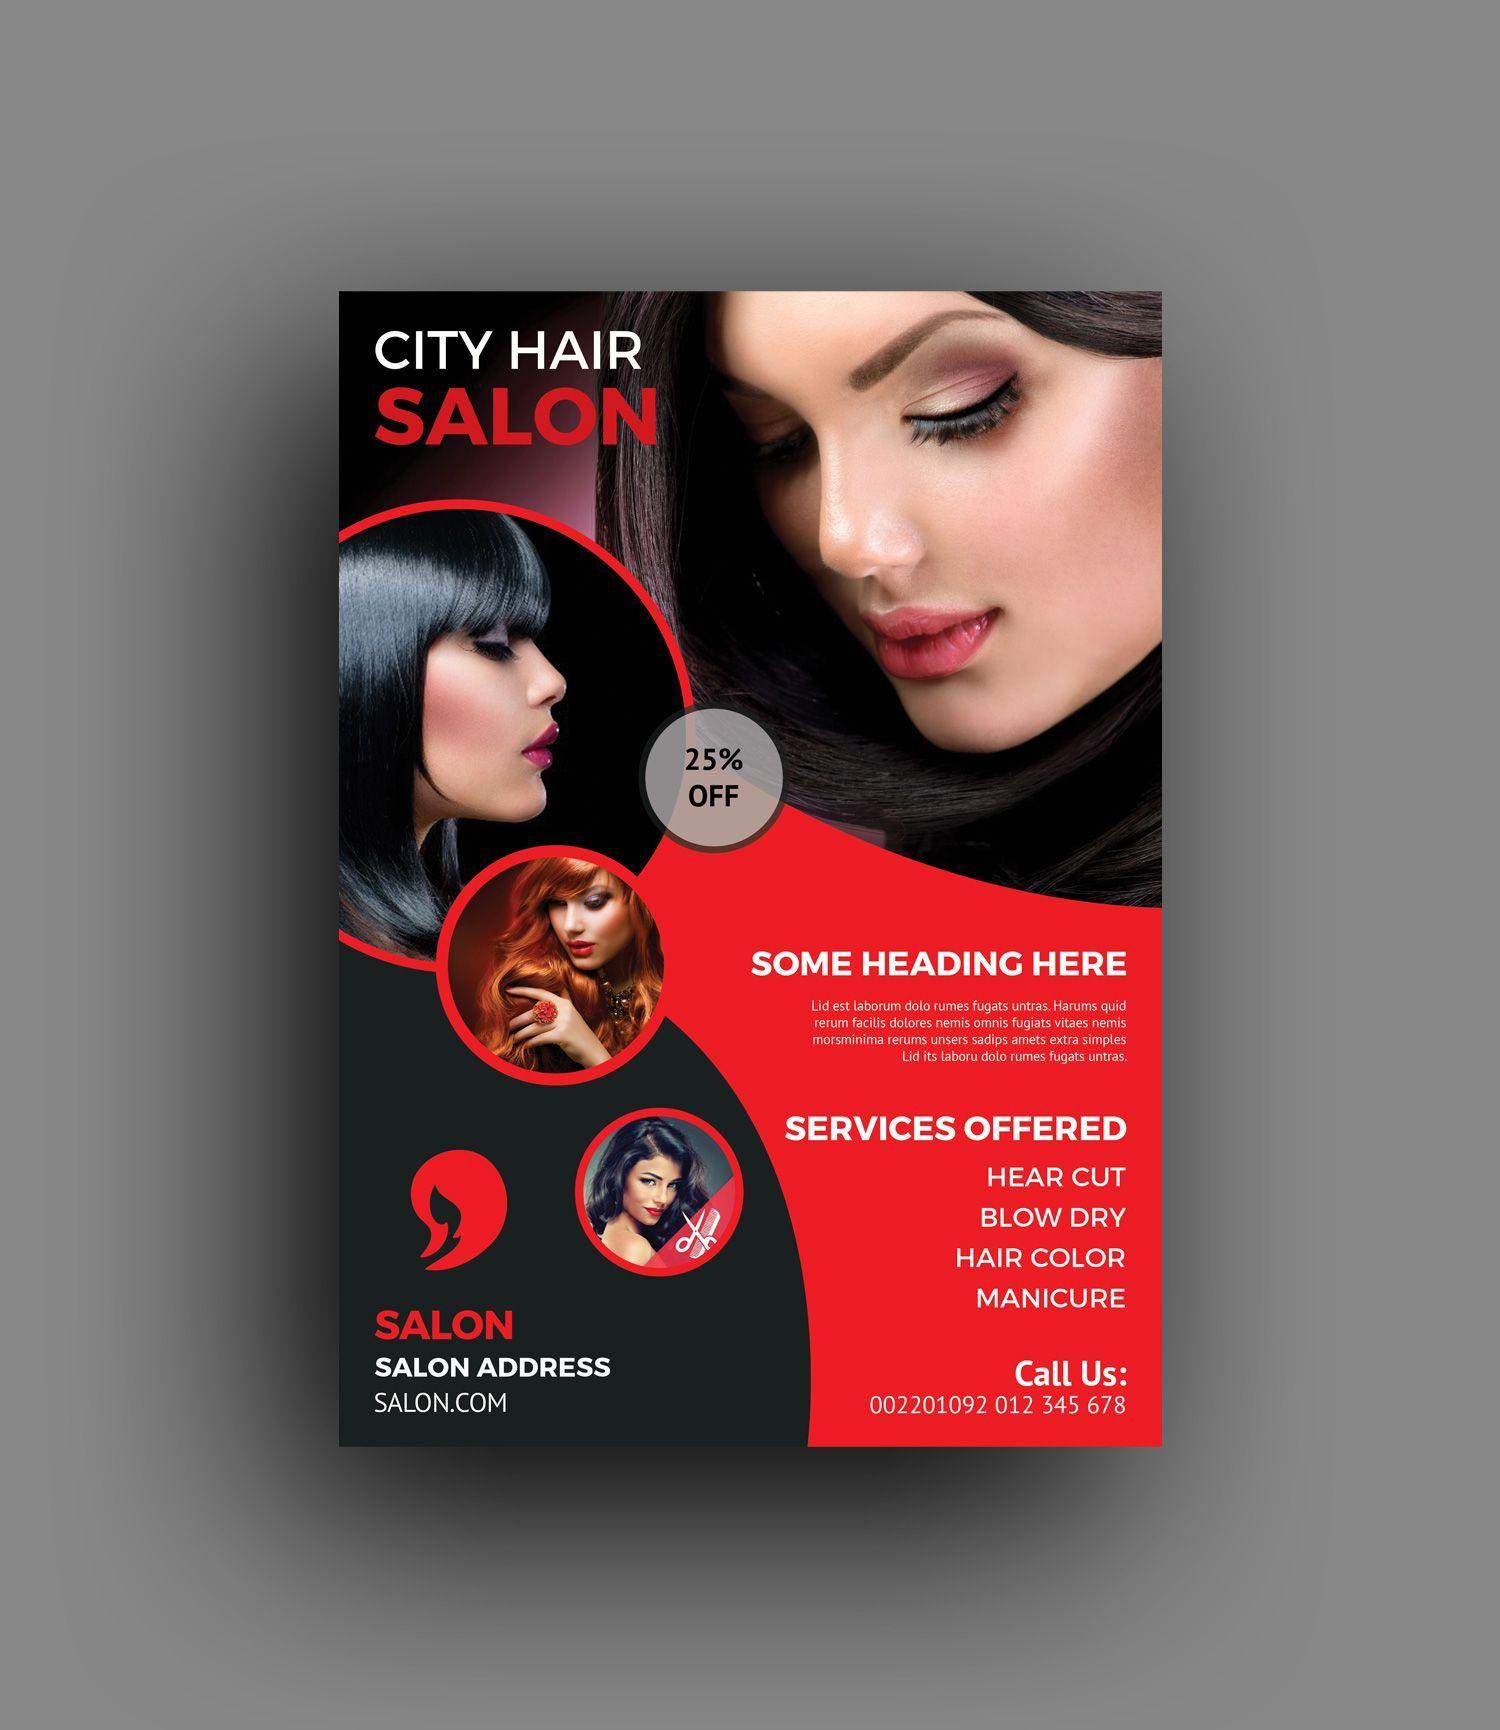 Elegant Hair Salon Flyer Template In 2020 Hair Salon Beauty Salon Posters Beauty Flyer Ideas